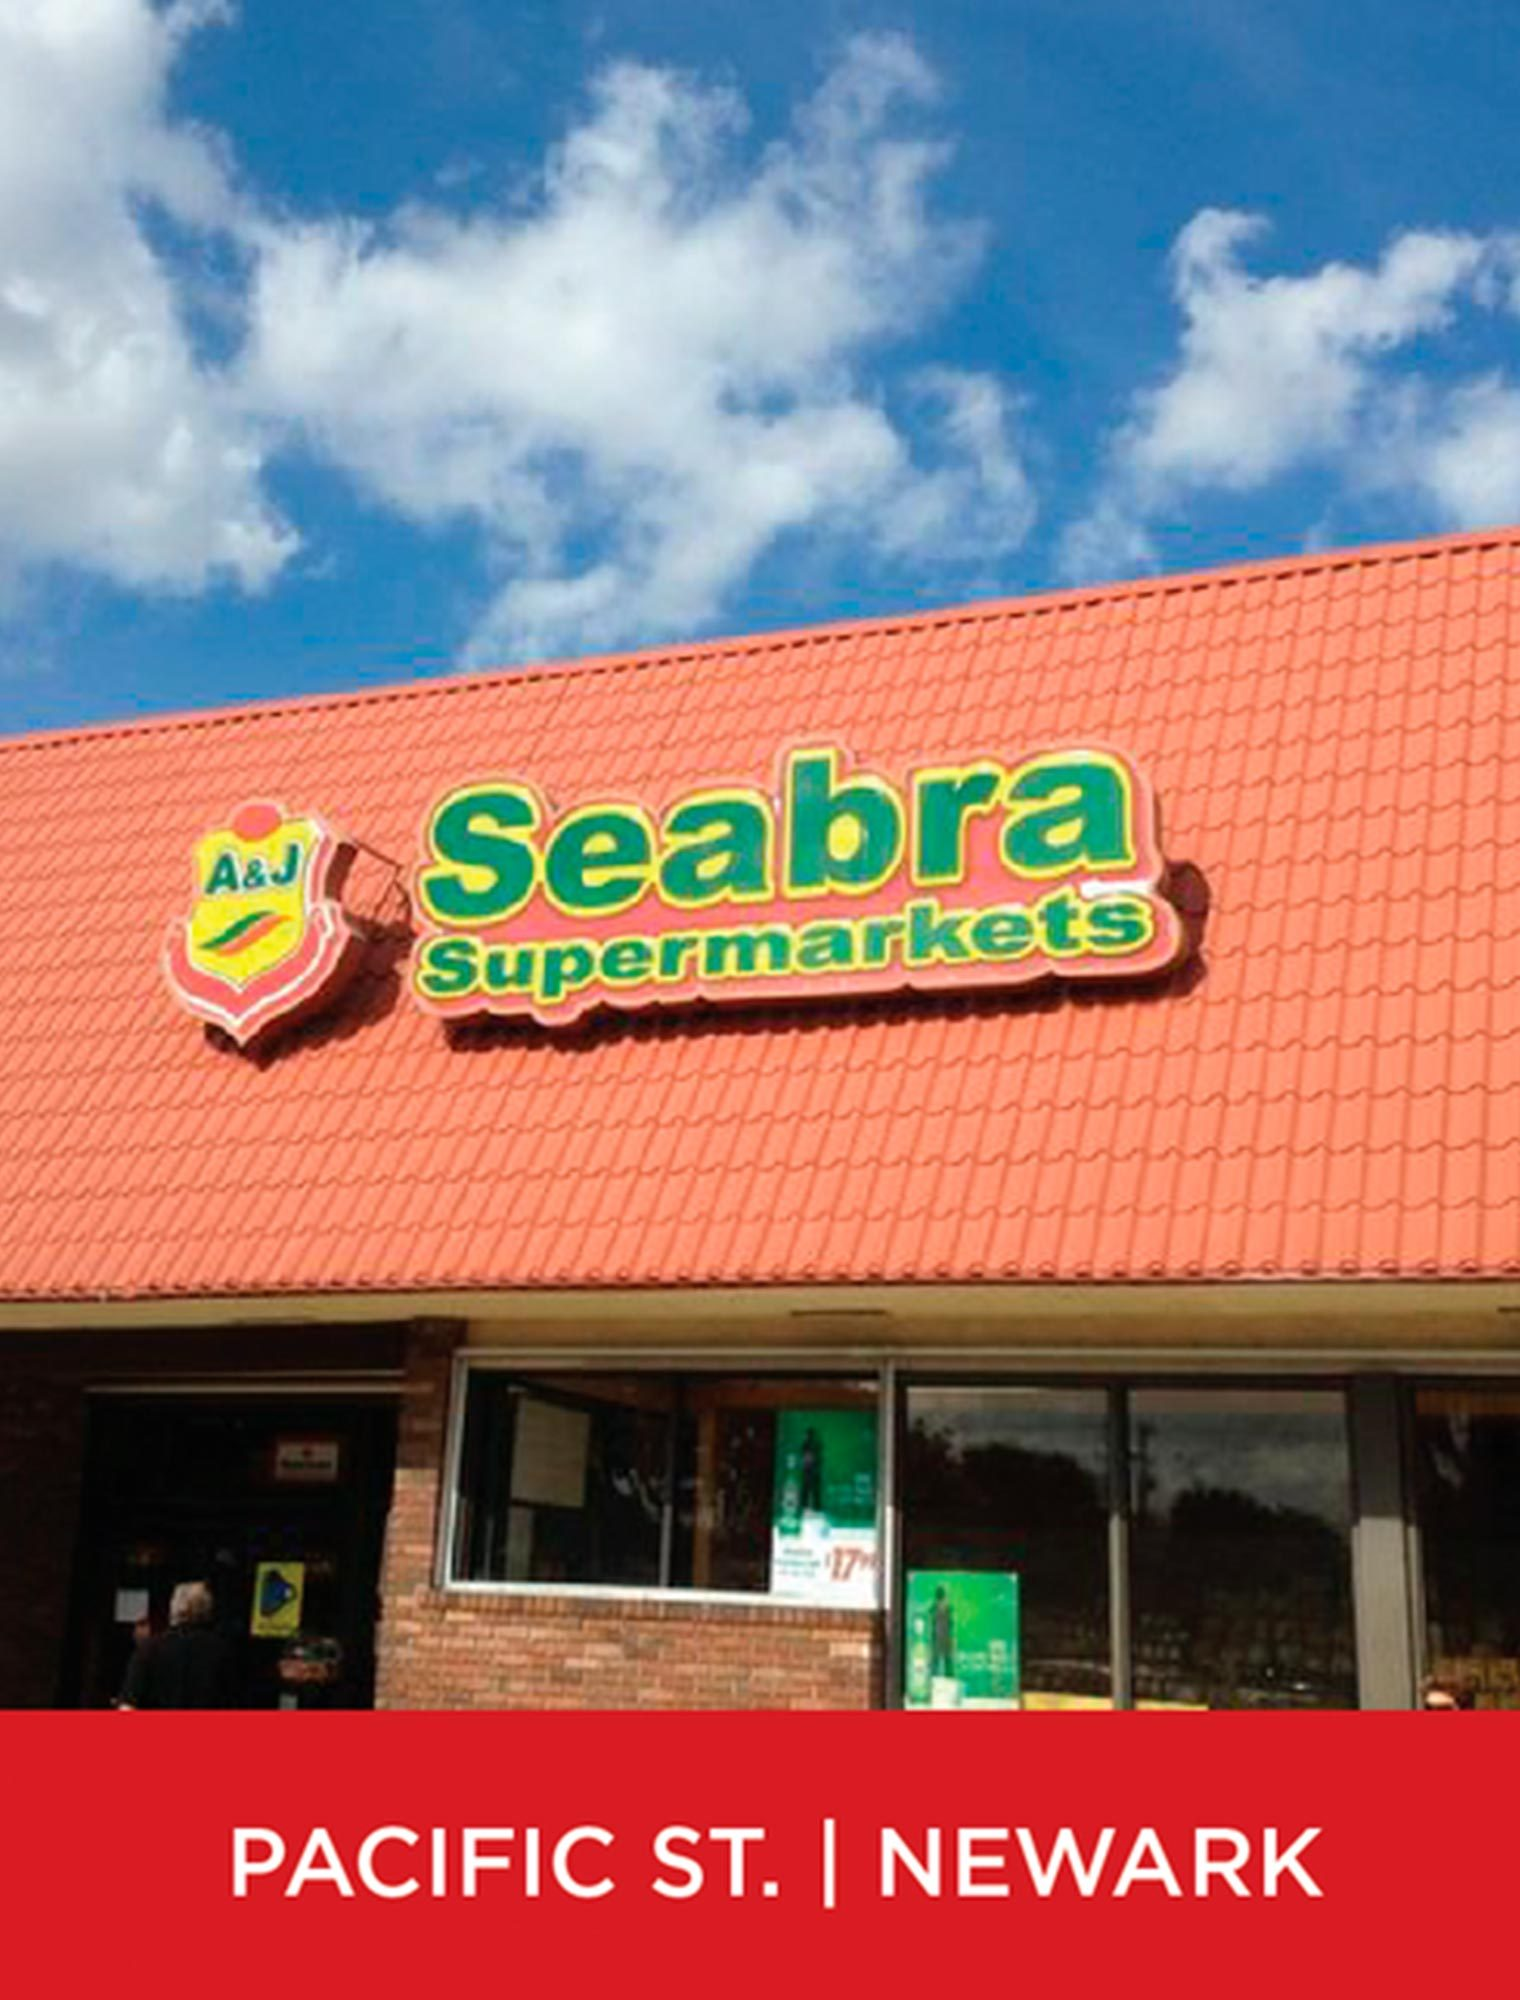 A&J Seabra's Supermarket